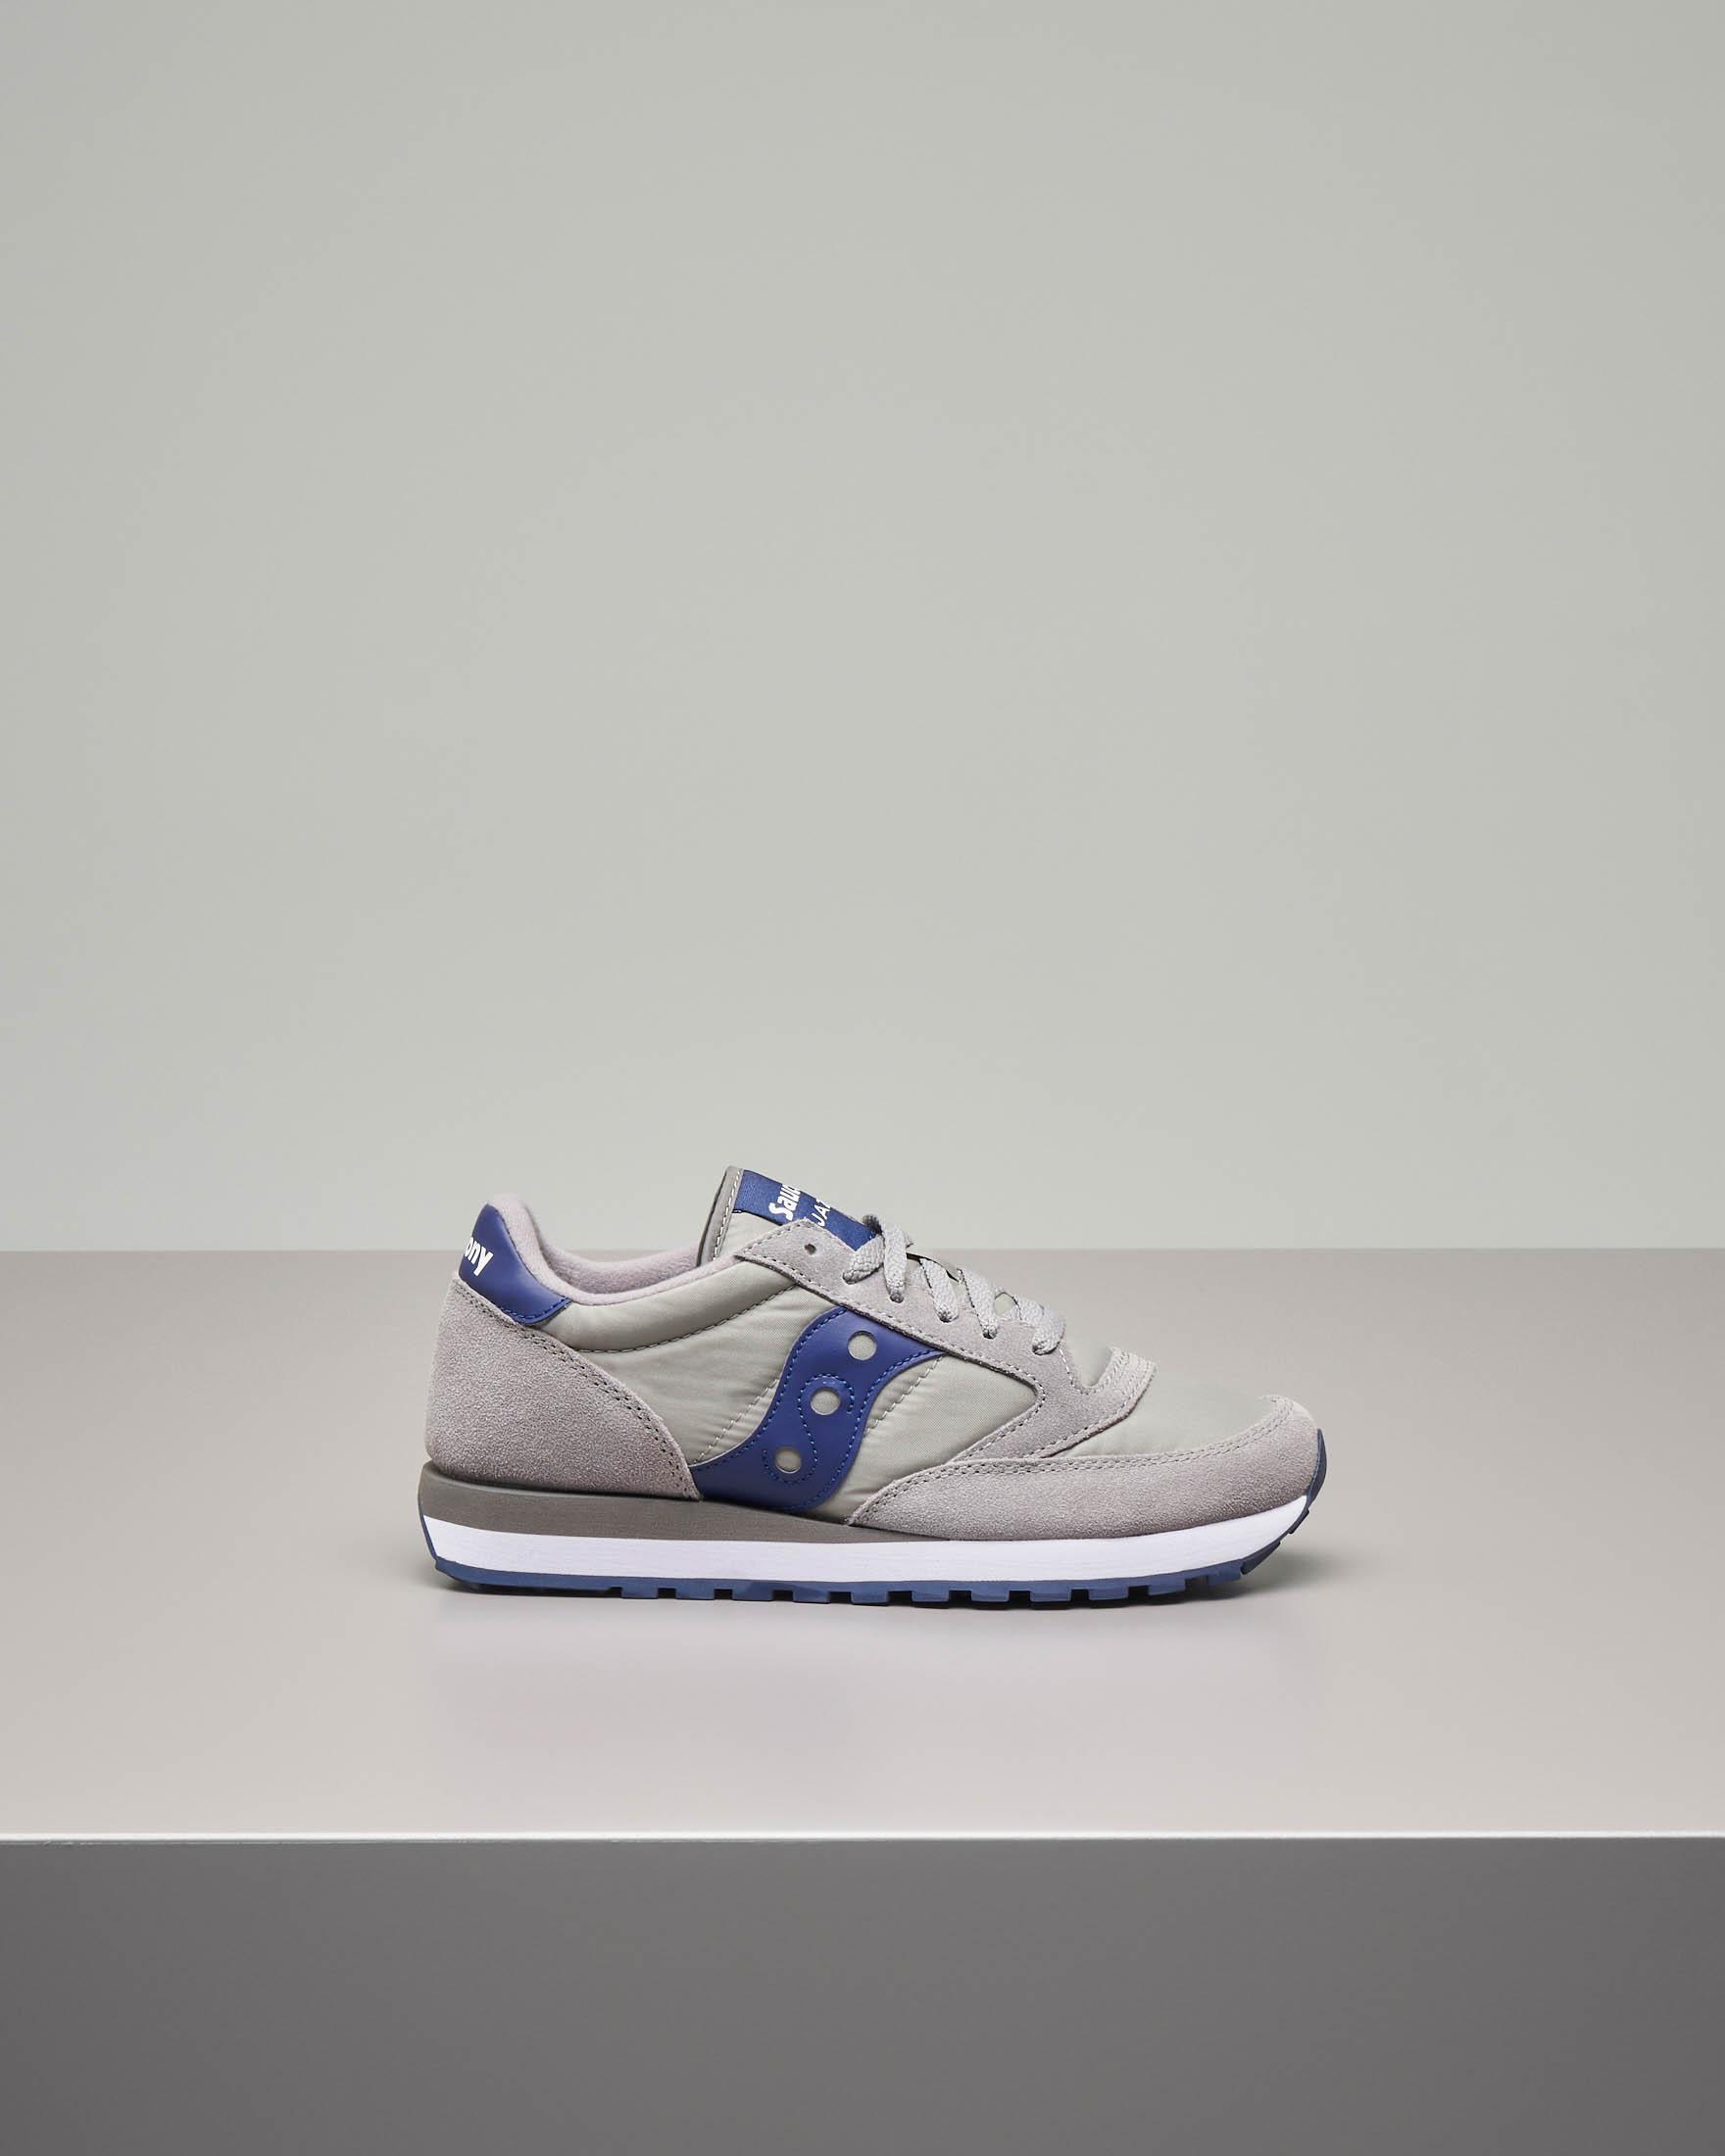 Sneakers Jazz O' grigie e blu